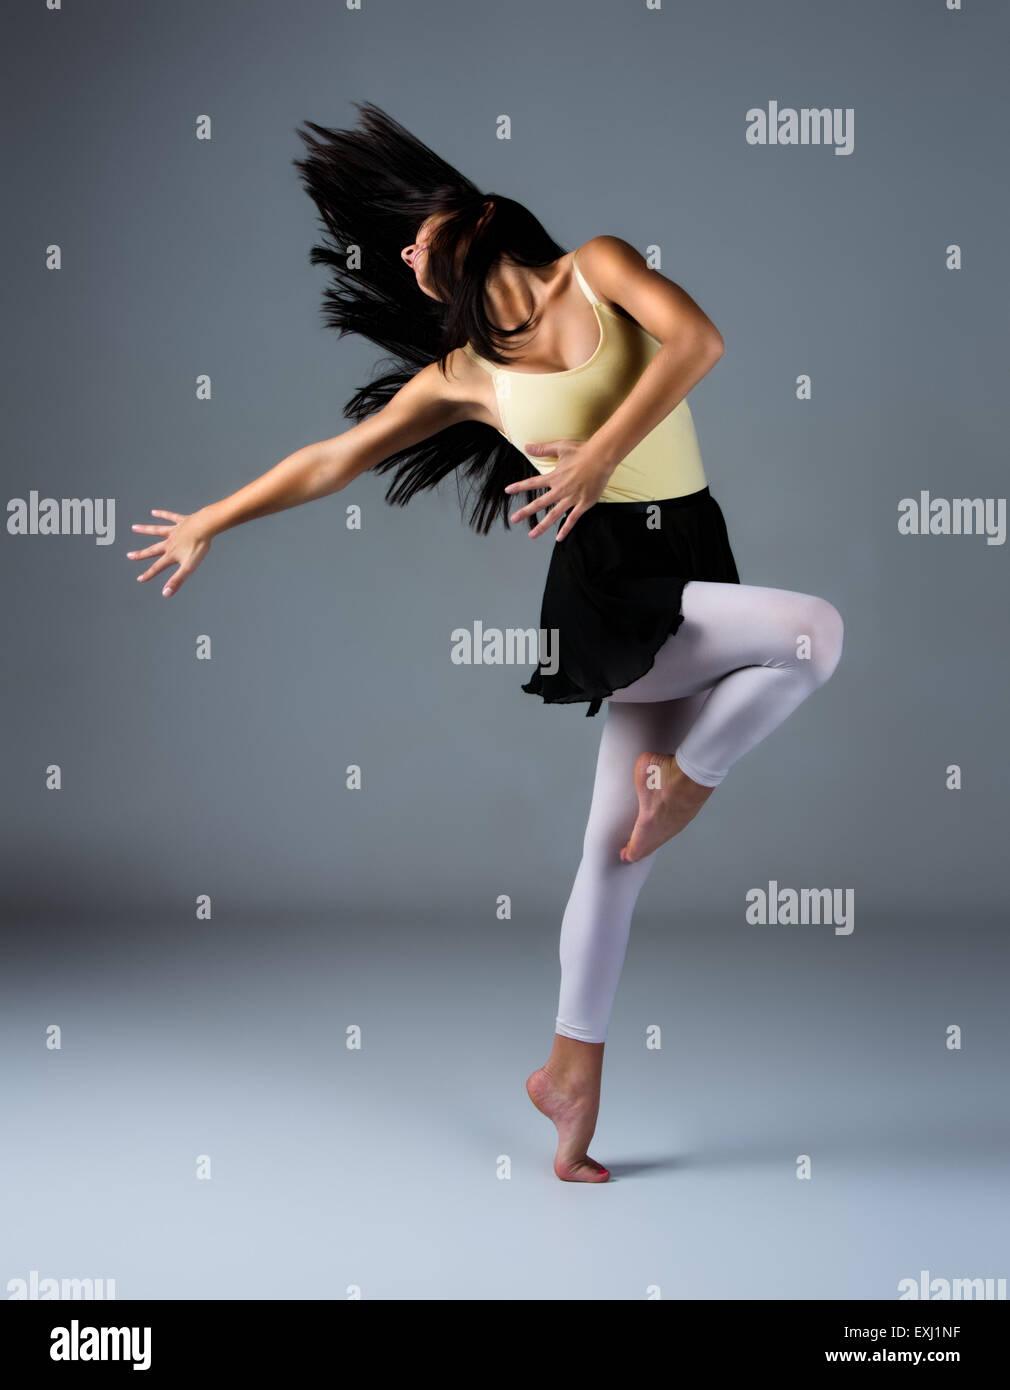 Modern Dance Barefoot Stockfotos & Modern Dance Barefoot Bilder - Alamy